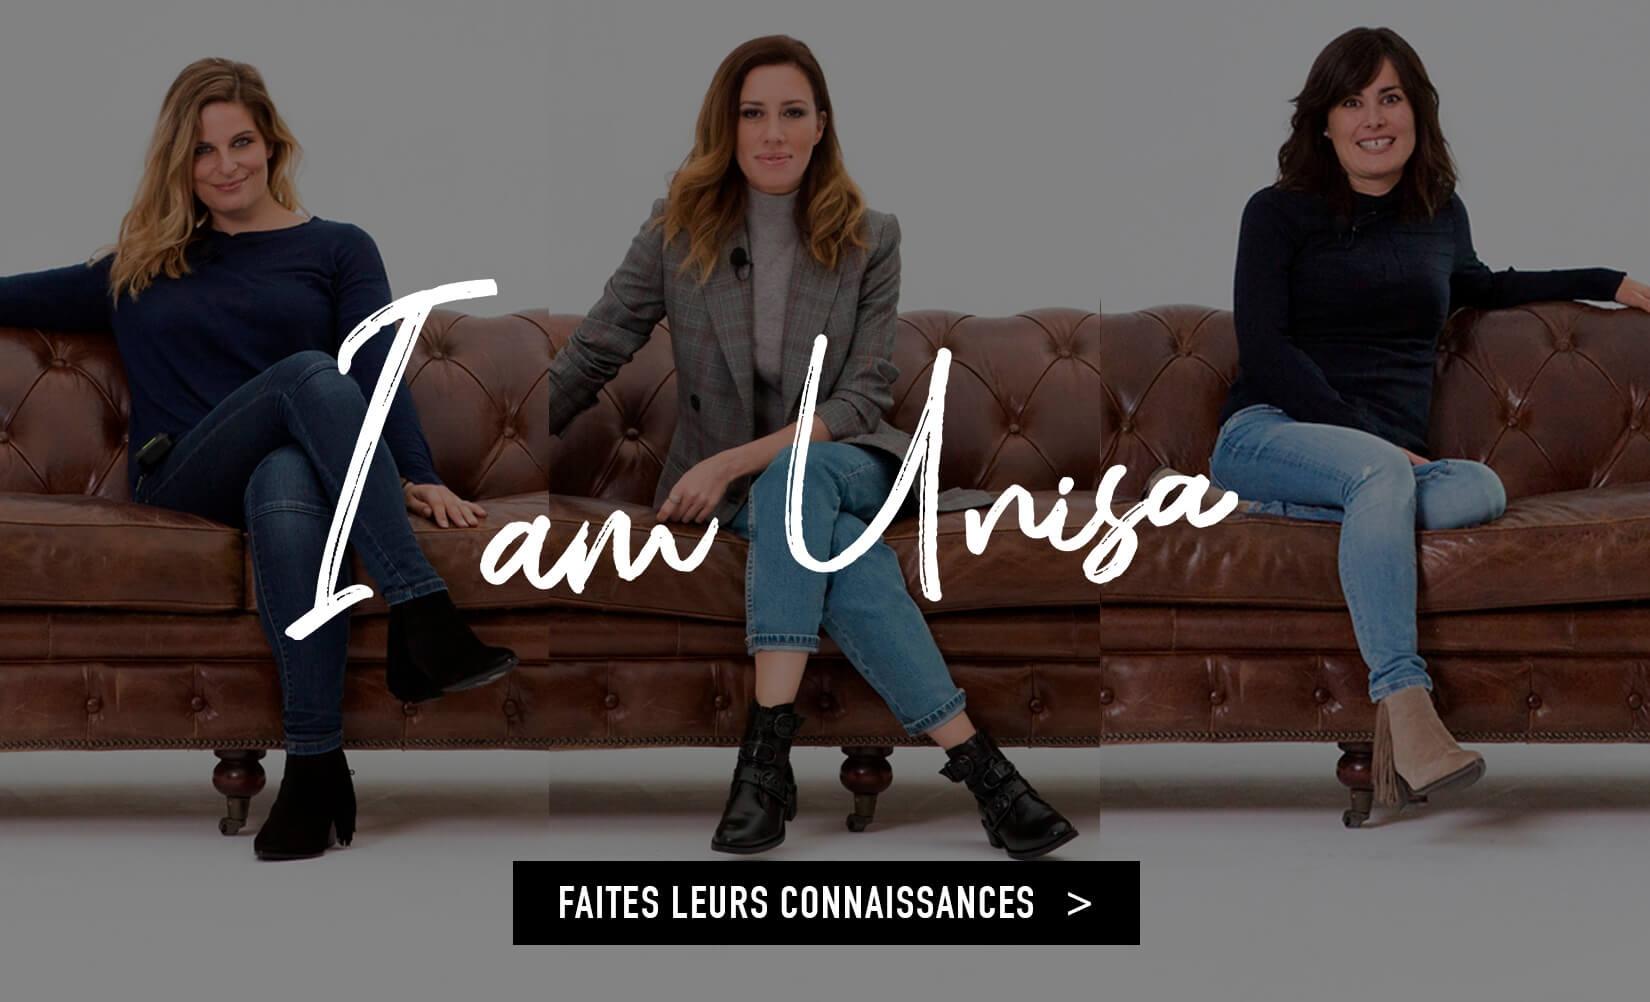 Officiel Unisa Vente Chaussures Femme Espagnoles Femmes b76gvyYf